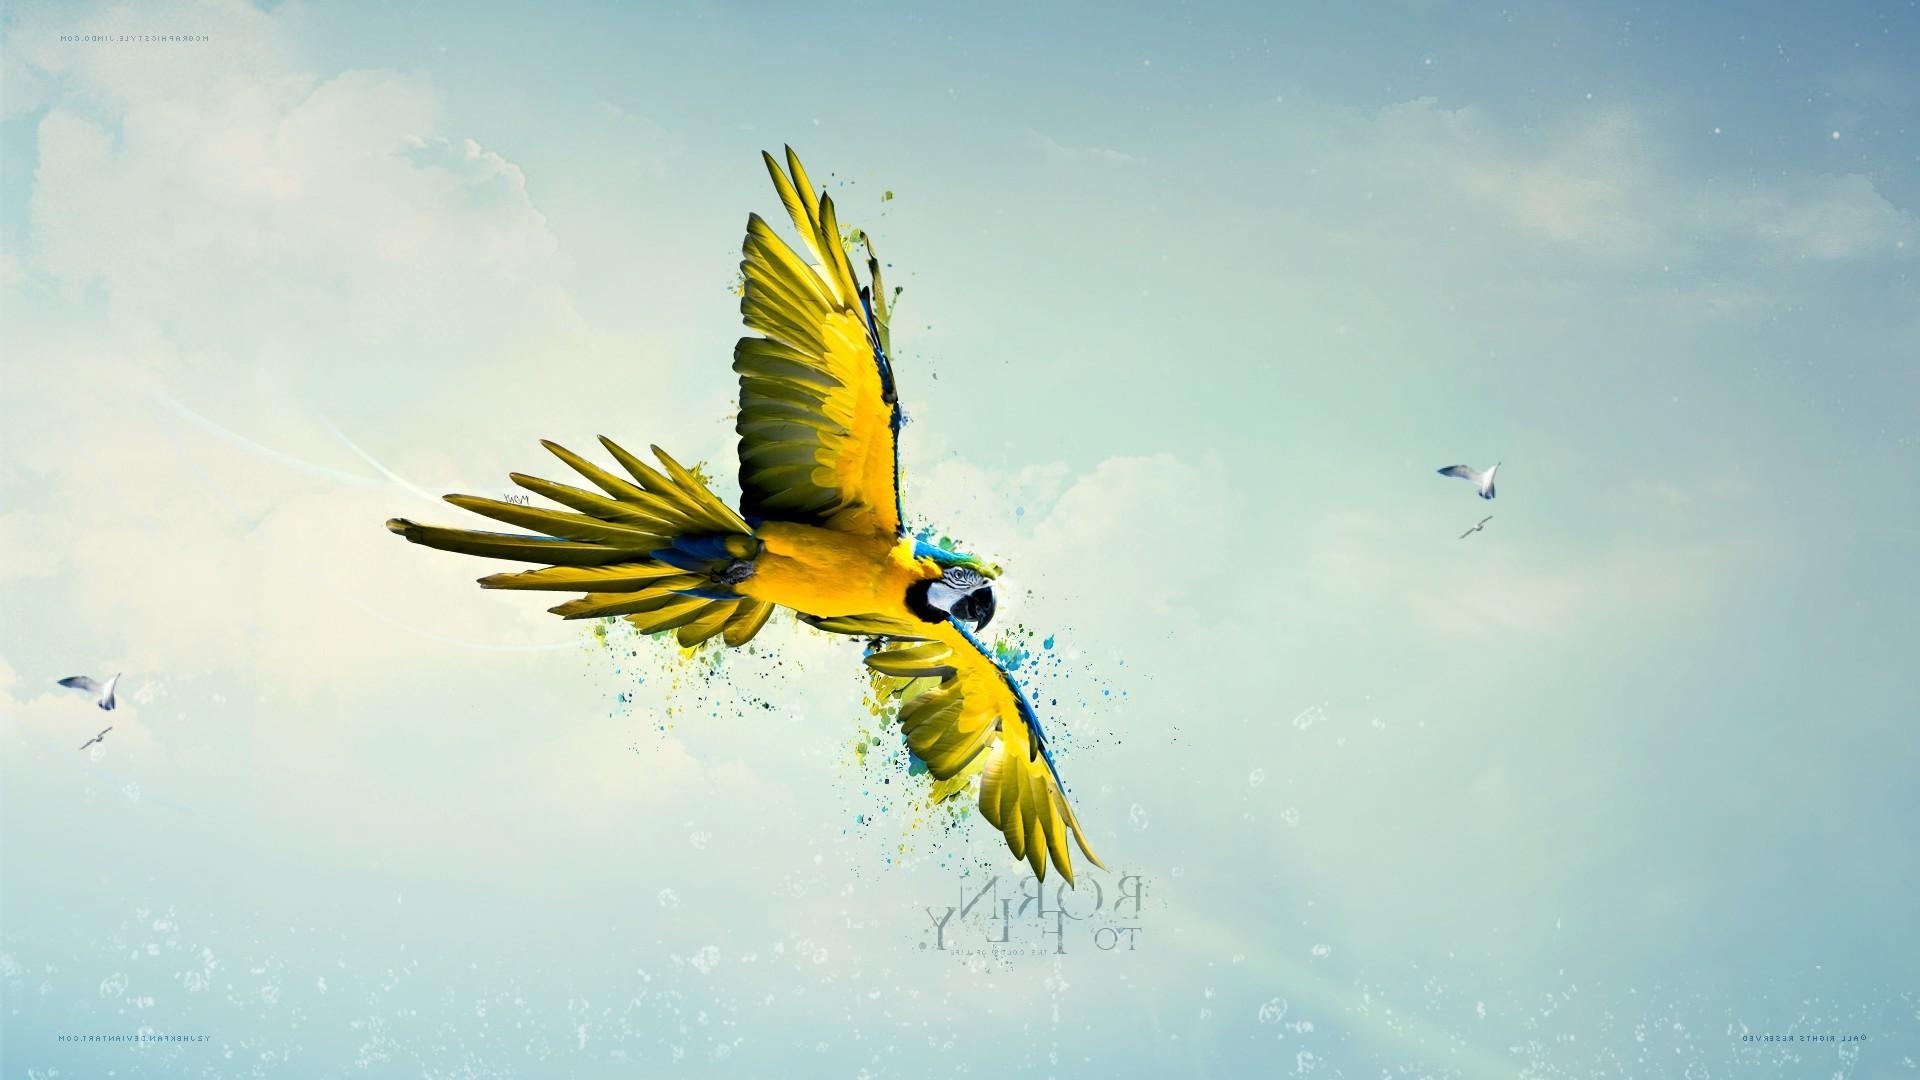 macaws birds sky parrot flying paint splatter Wallpapers HD 1920x1080